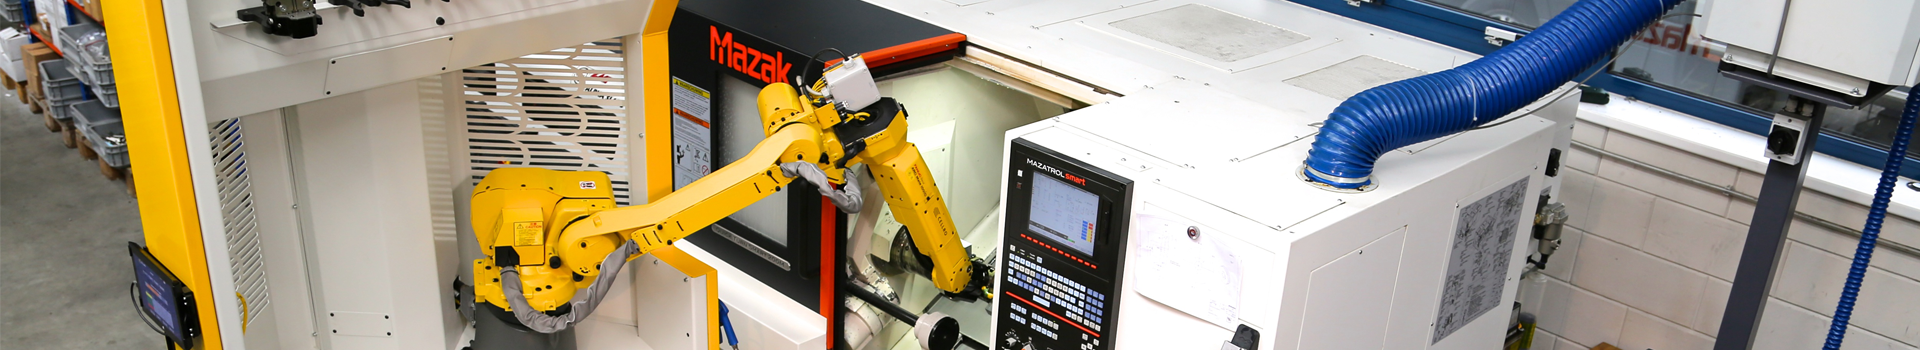 Automation of a Mazak | Cellro com | Xcelerate | Automation